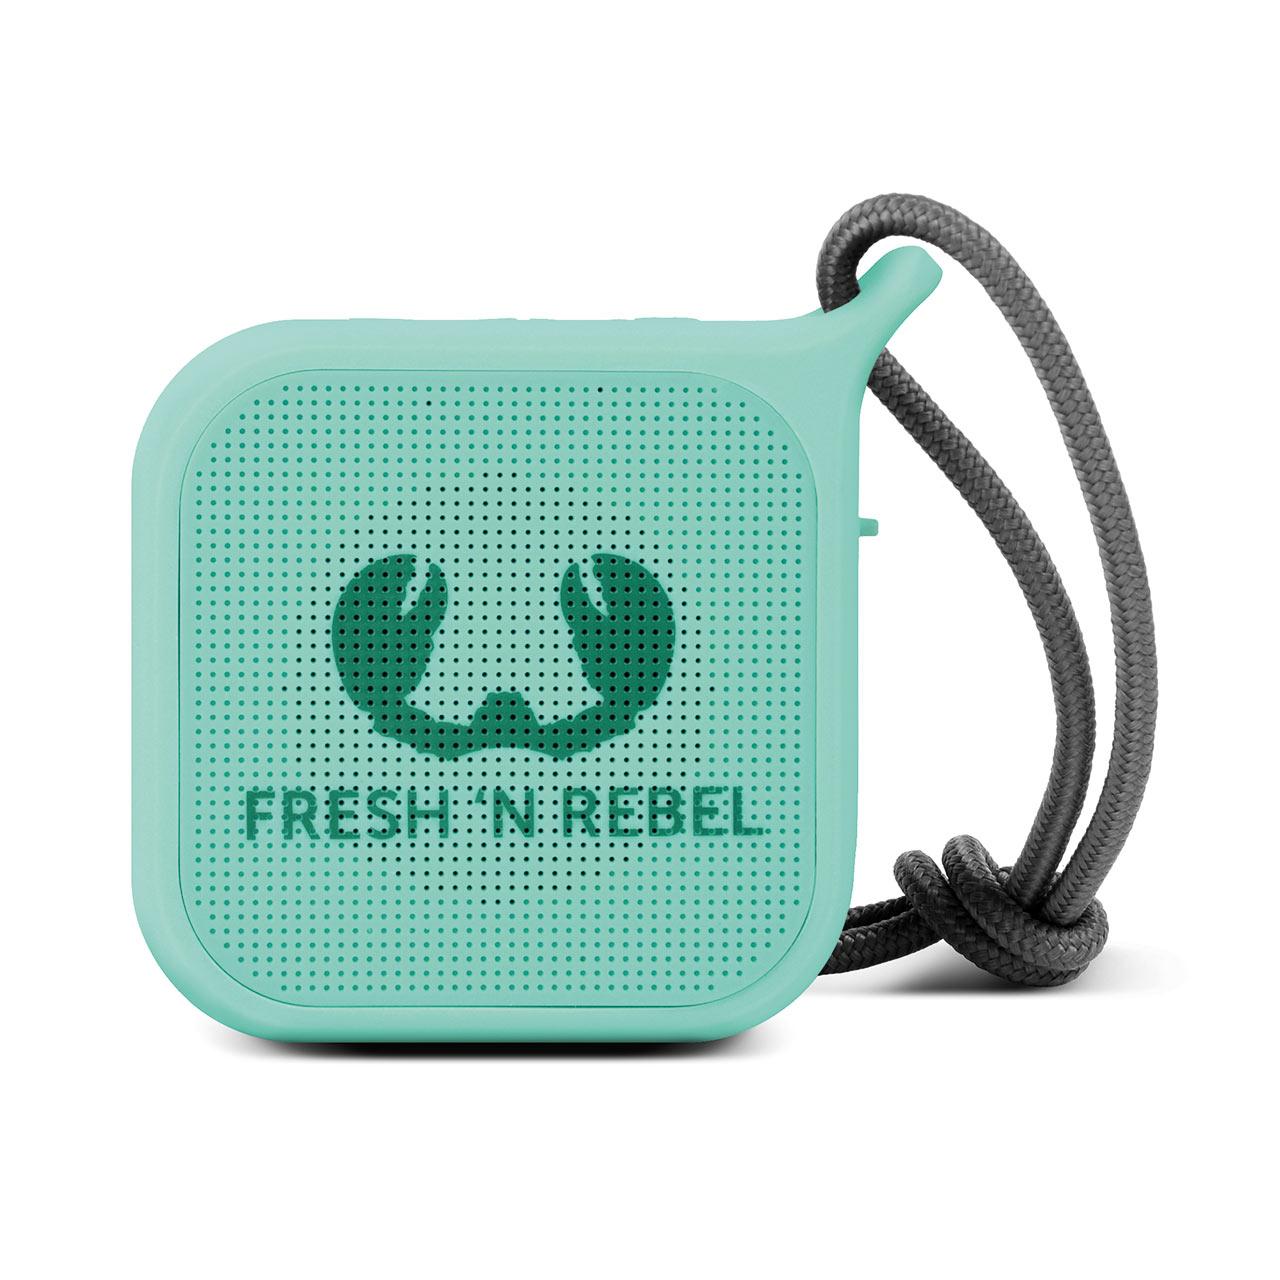 fresh n rebel kopfhörer